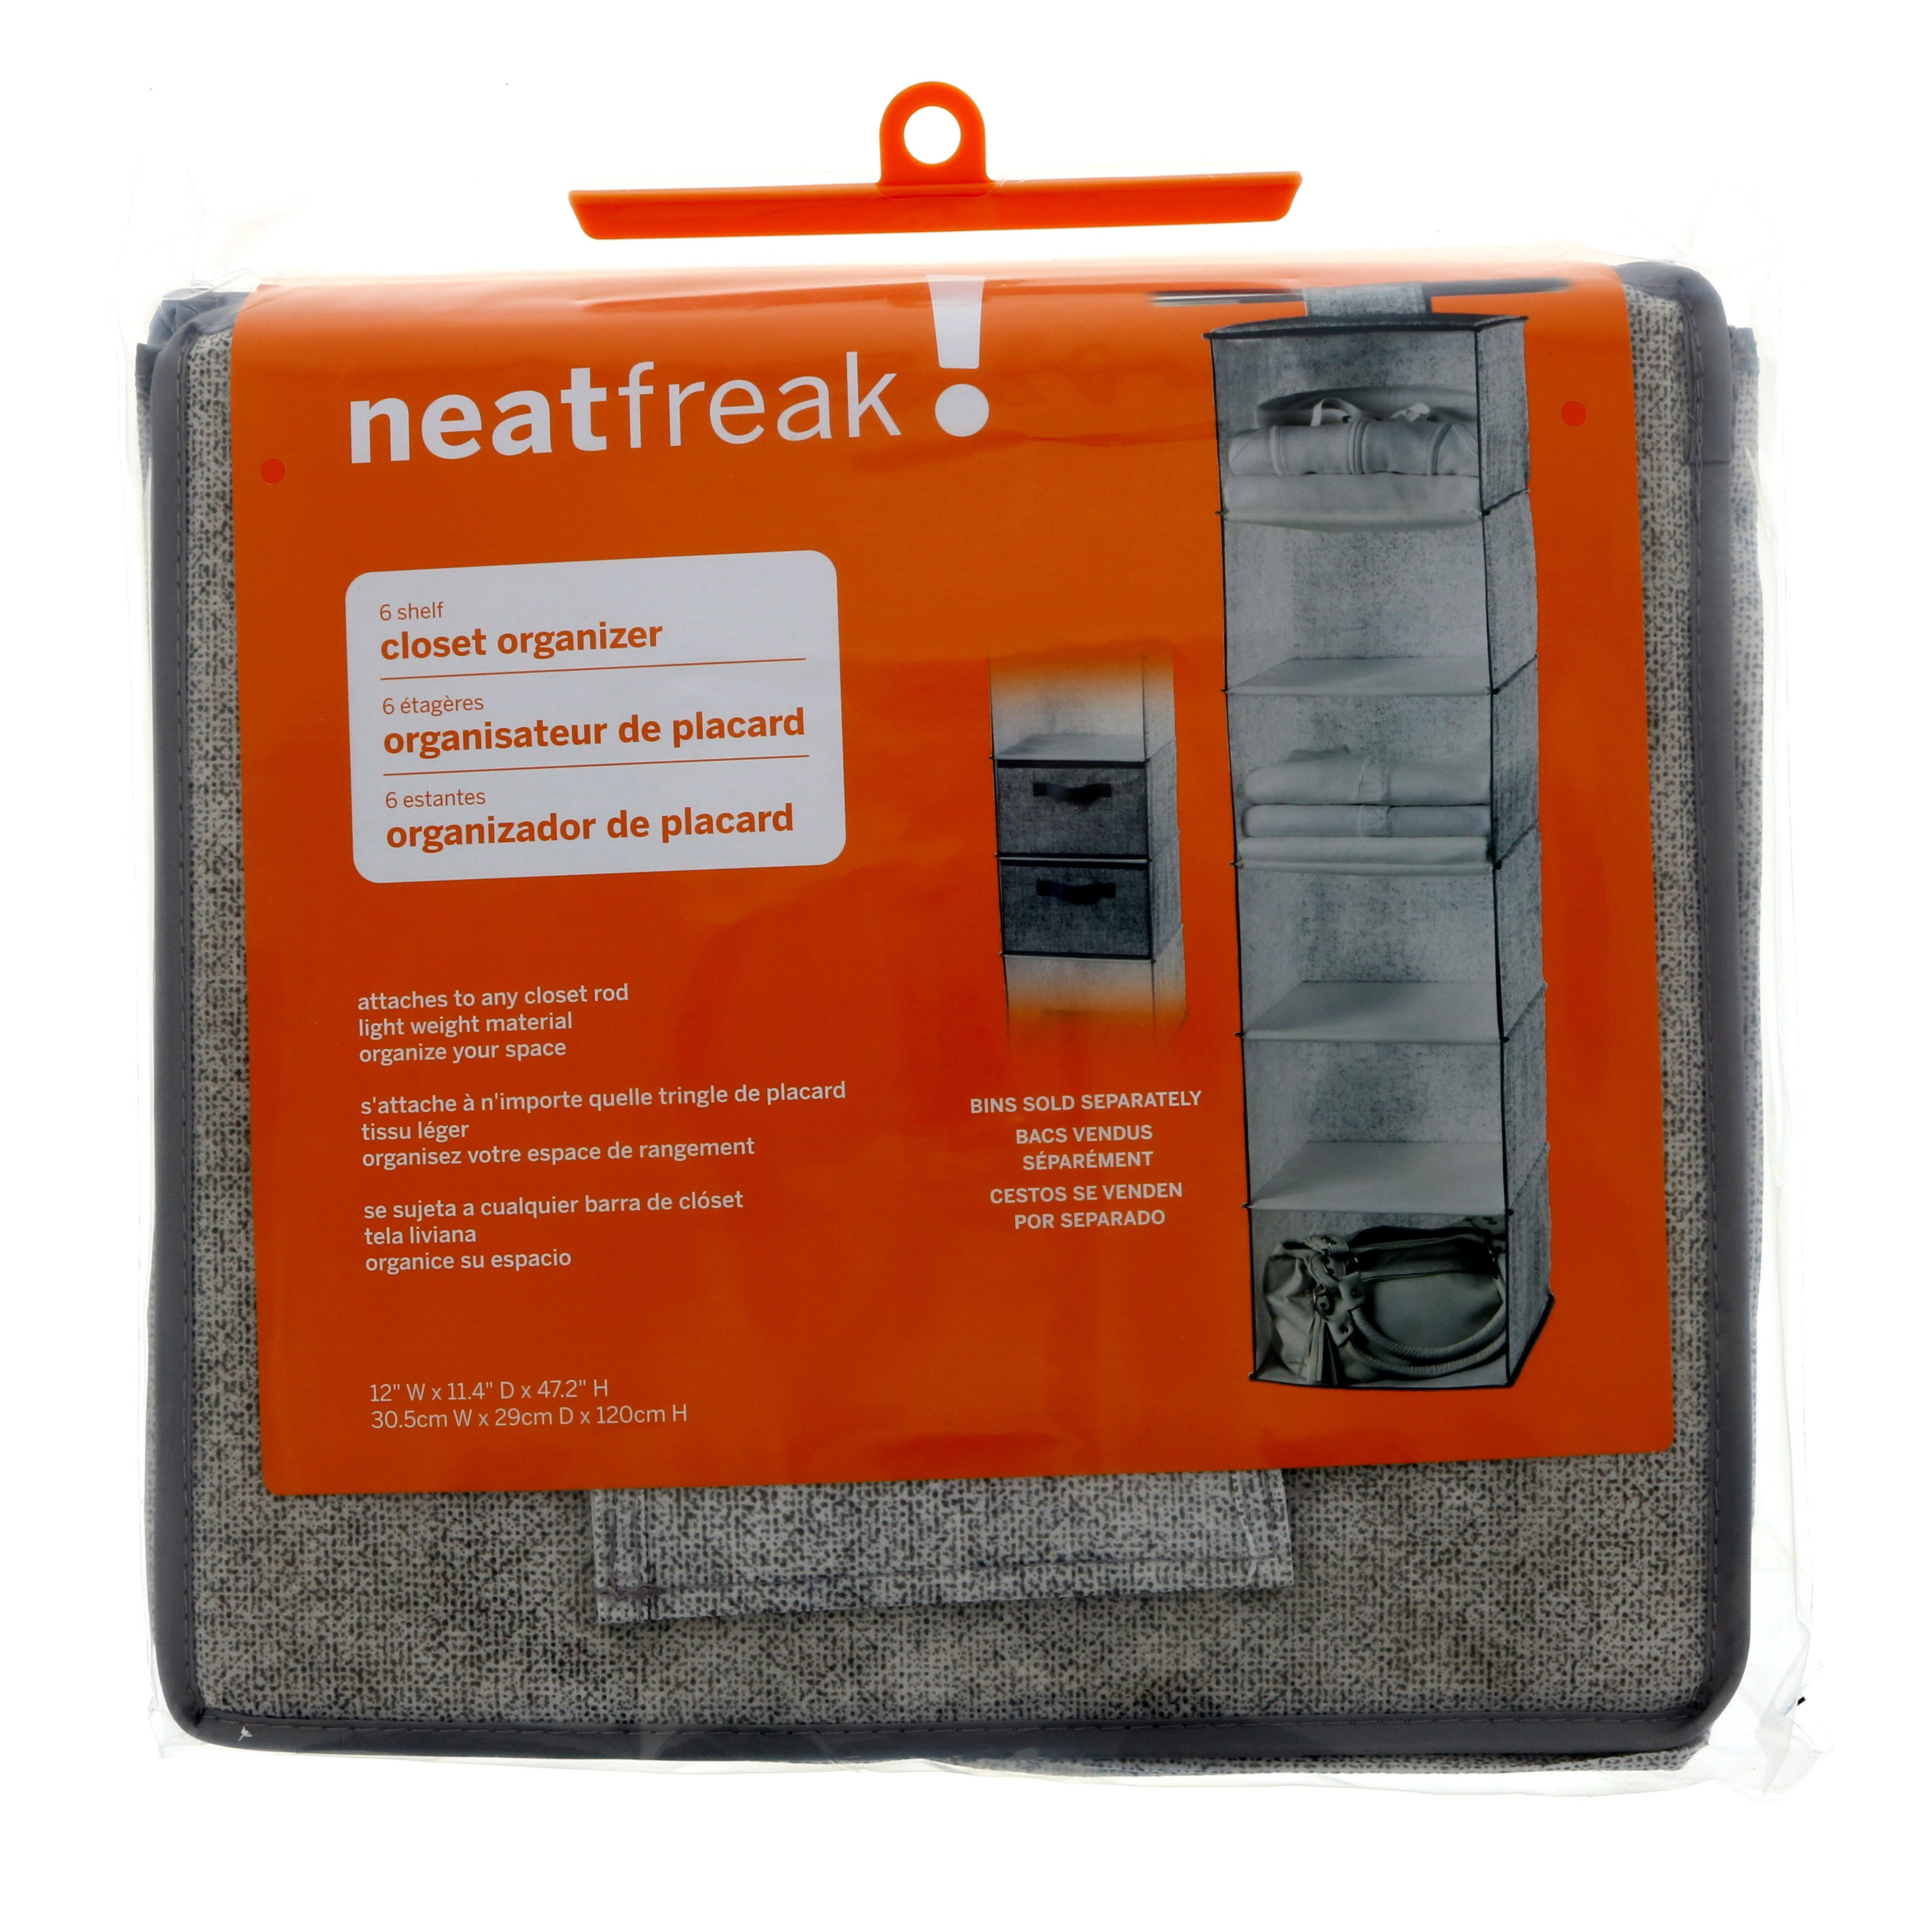 Neatfreak! 6 Shelf Closet Organizer, Harmony Twill   Shop Closet  Organization At HEB